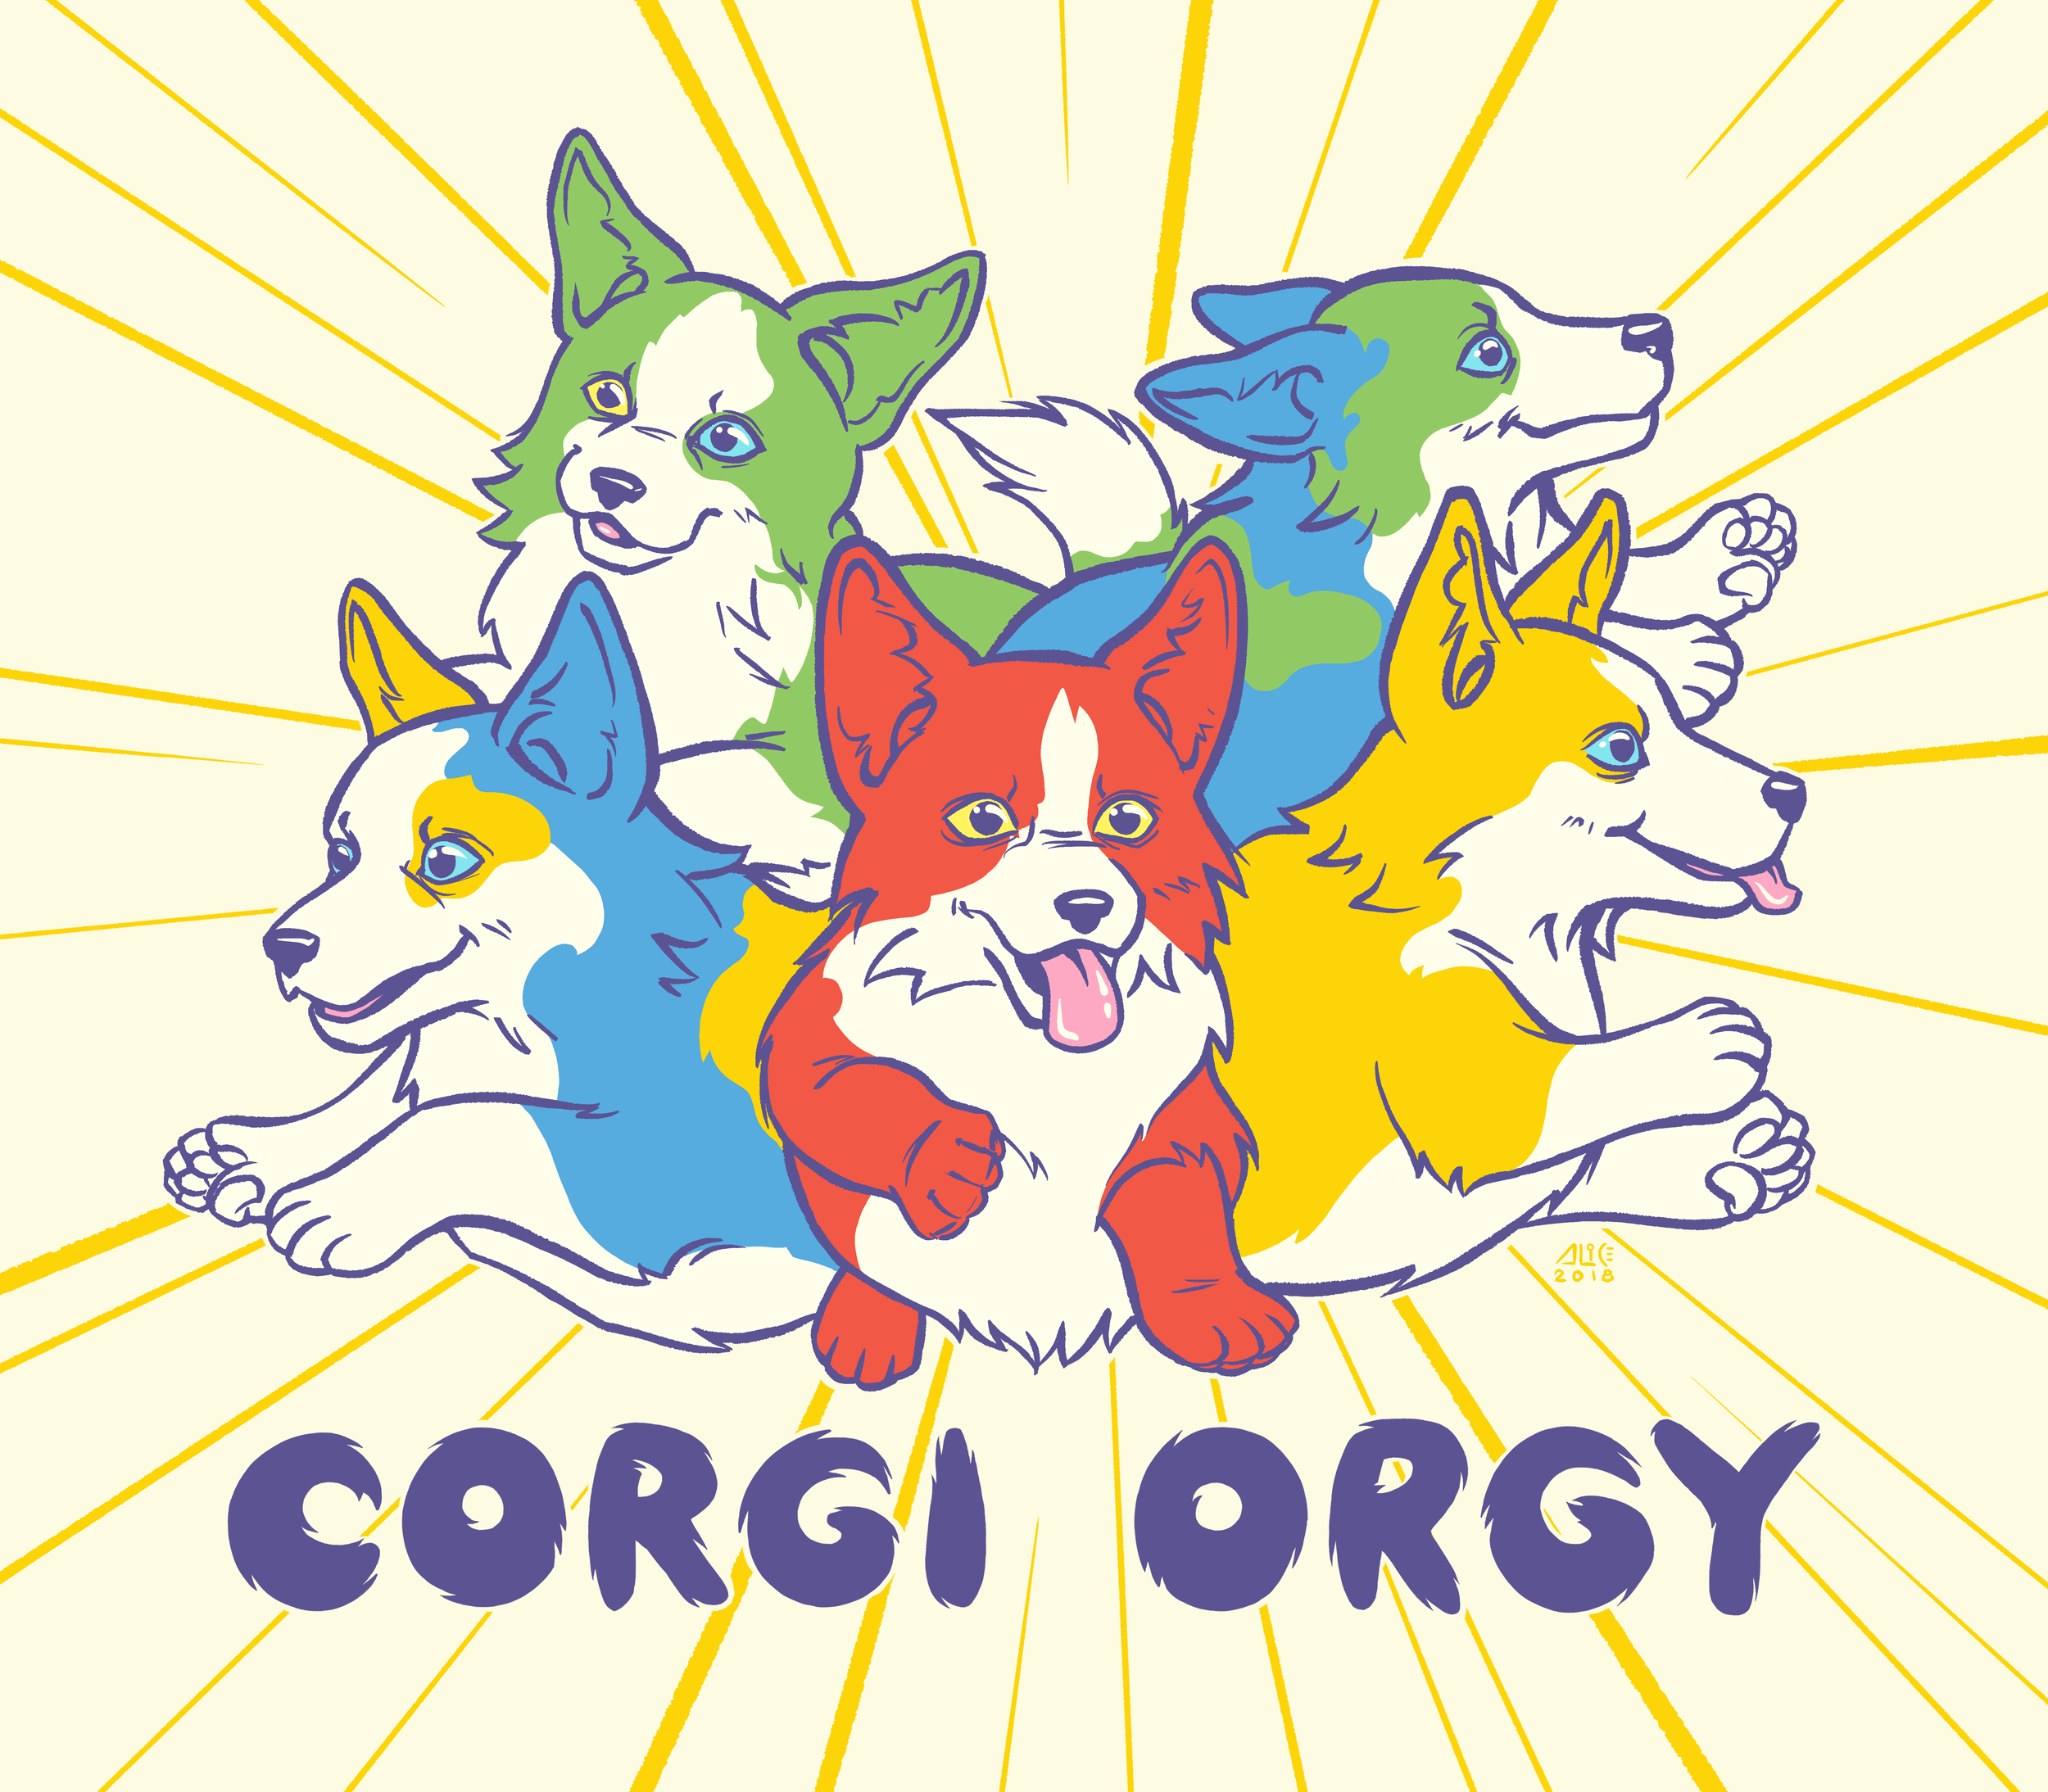 Corgi_Orgy_web.png